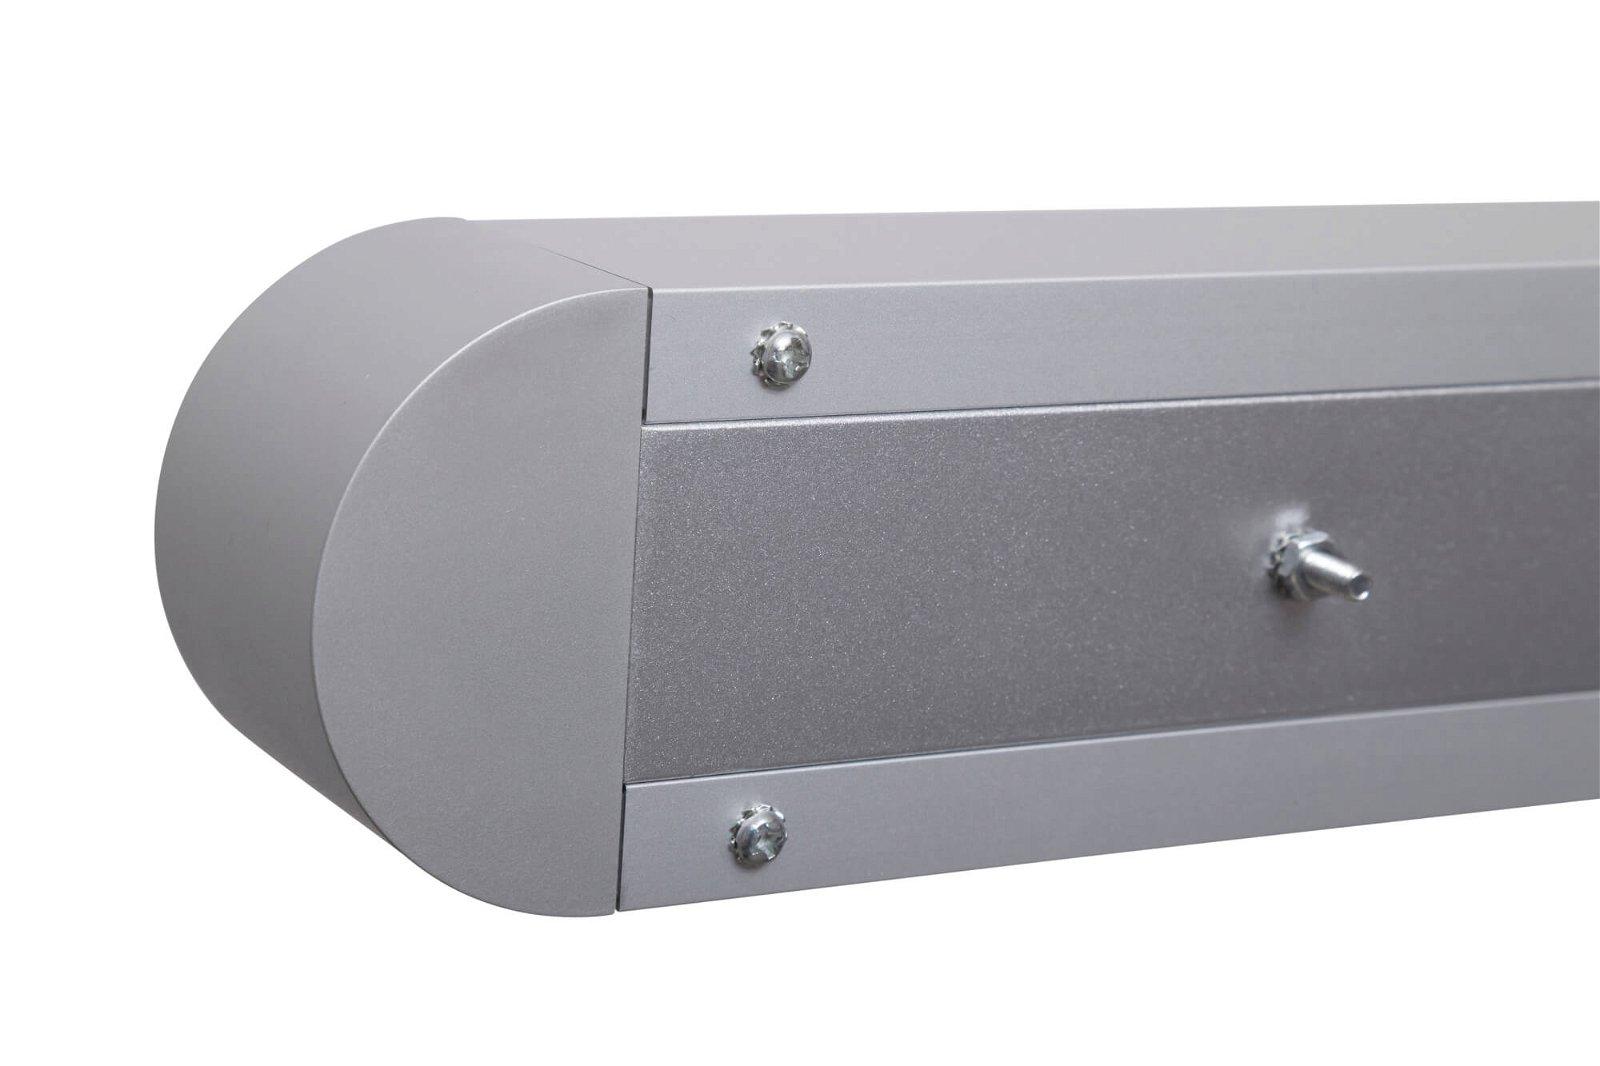 LED-Pendelleuchte MAULstraight, 45 W, 157,5 cm, silber